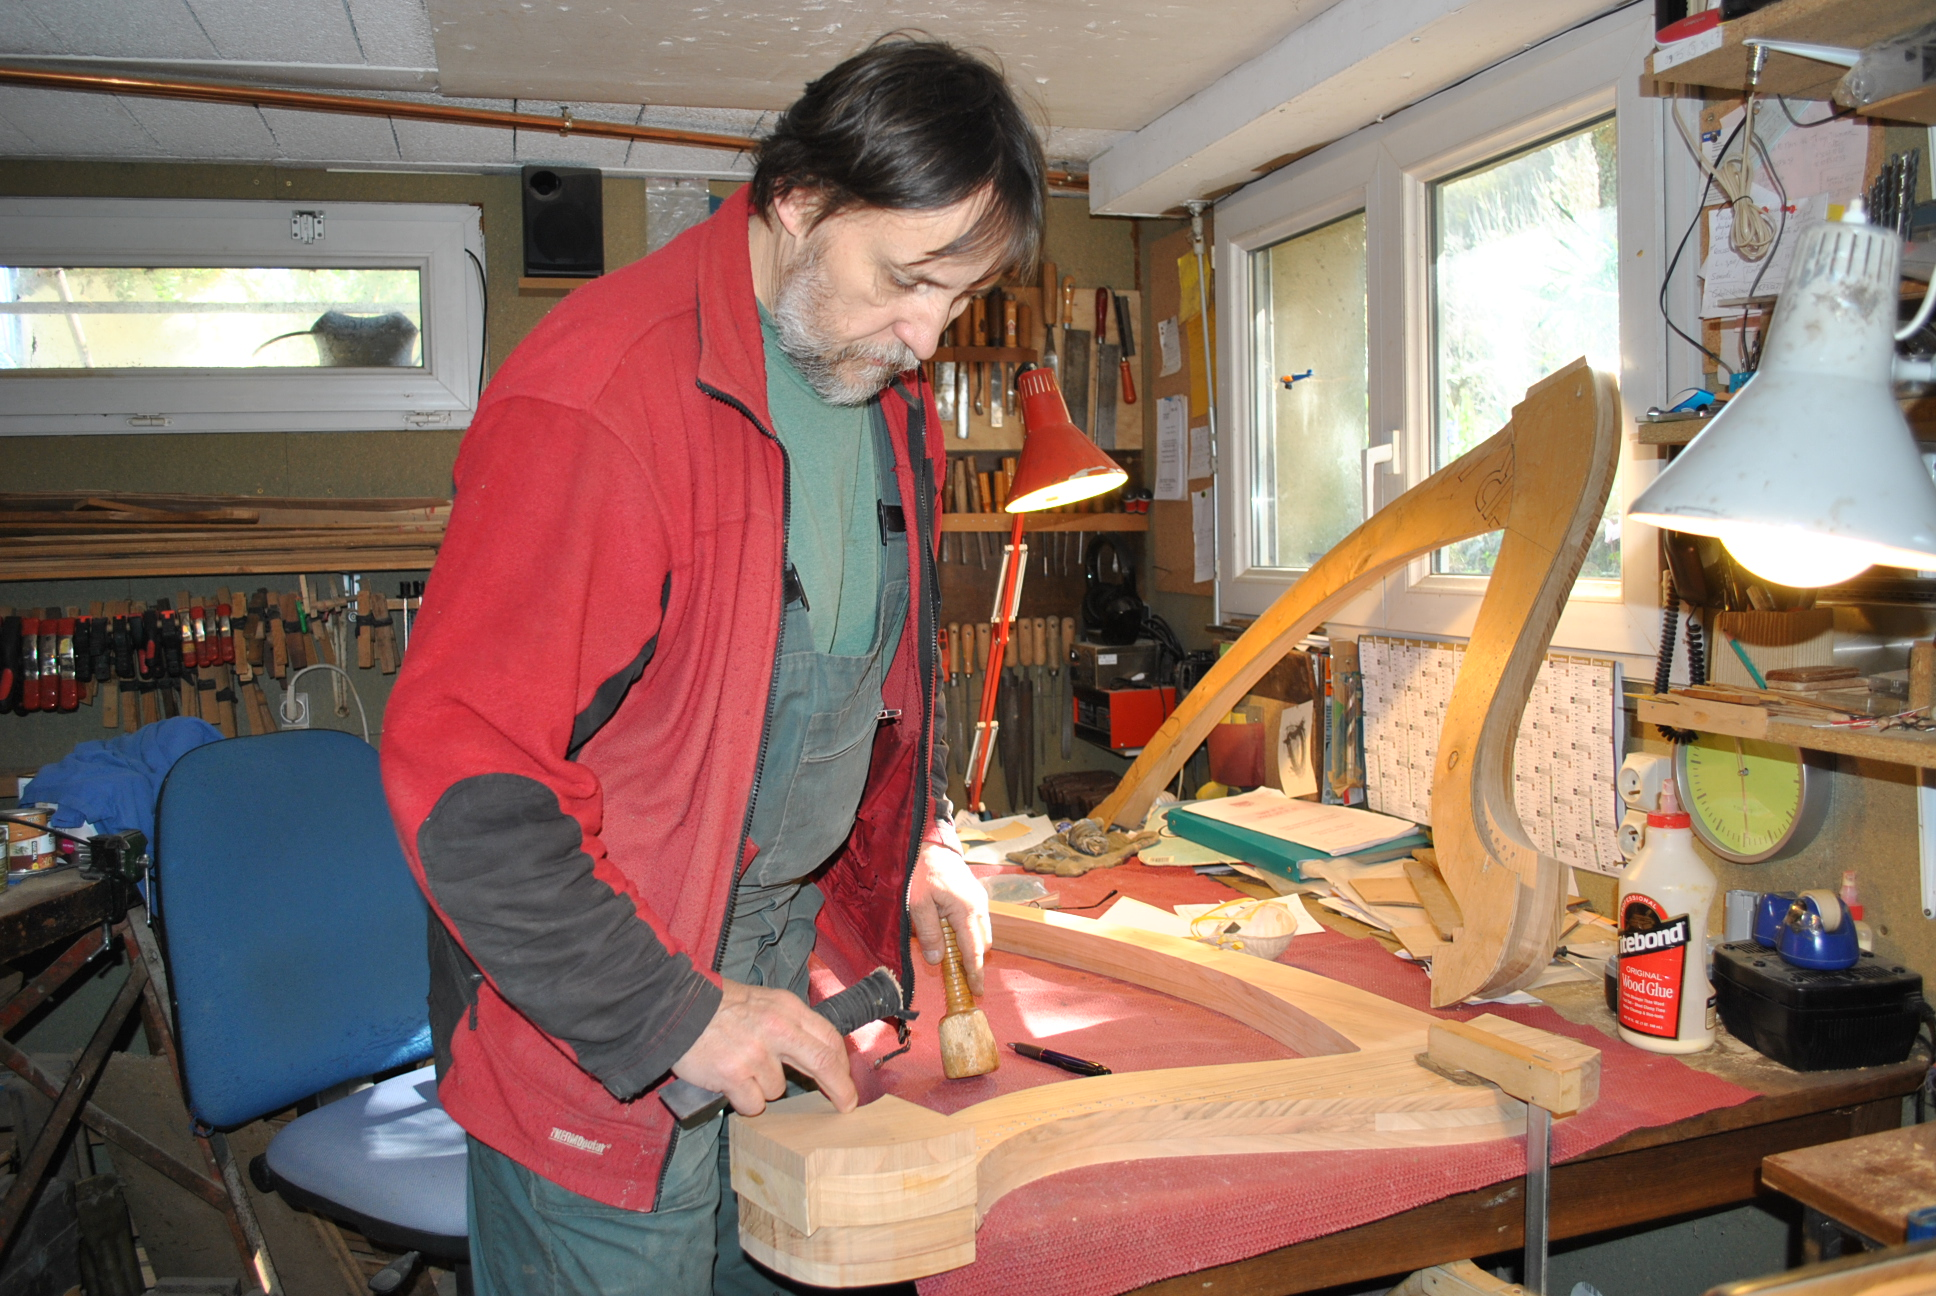 dinan rencontres internationales de harpe celtique